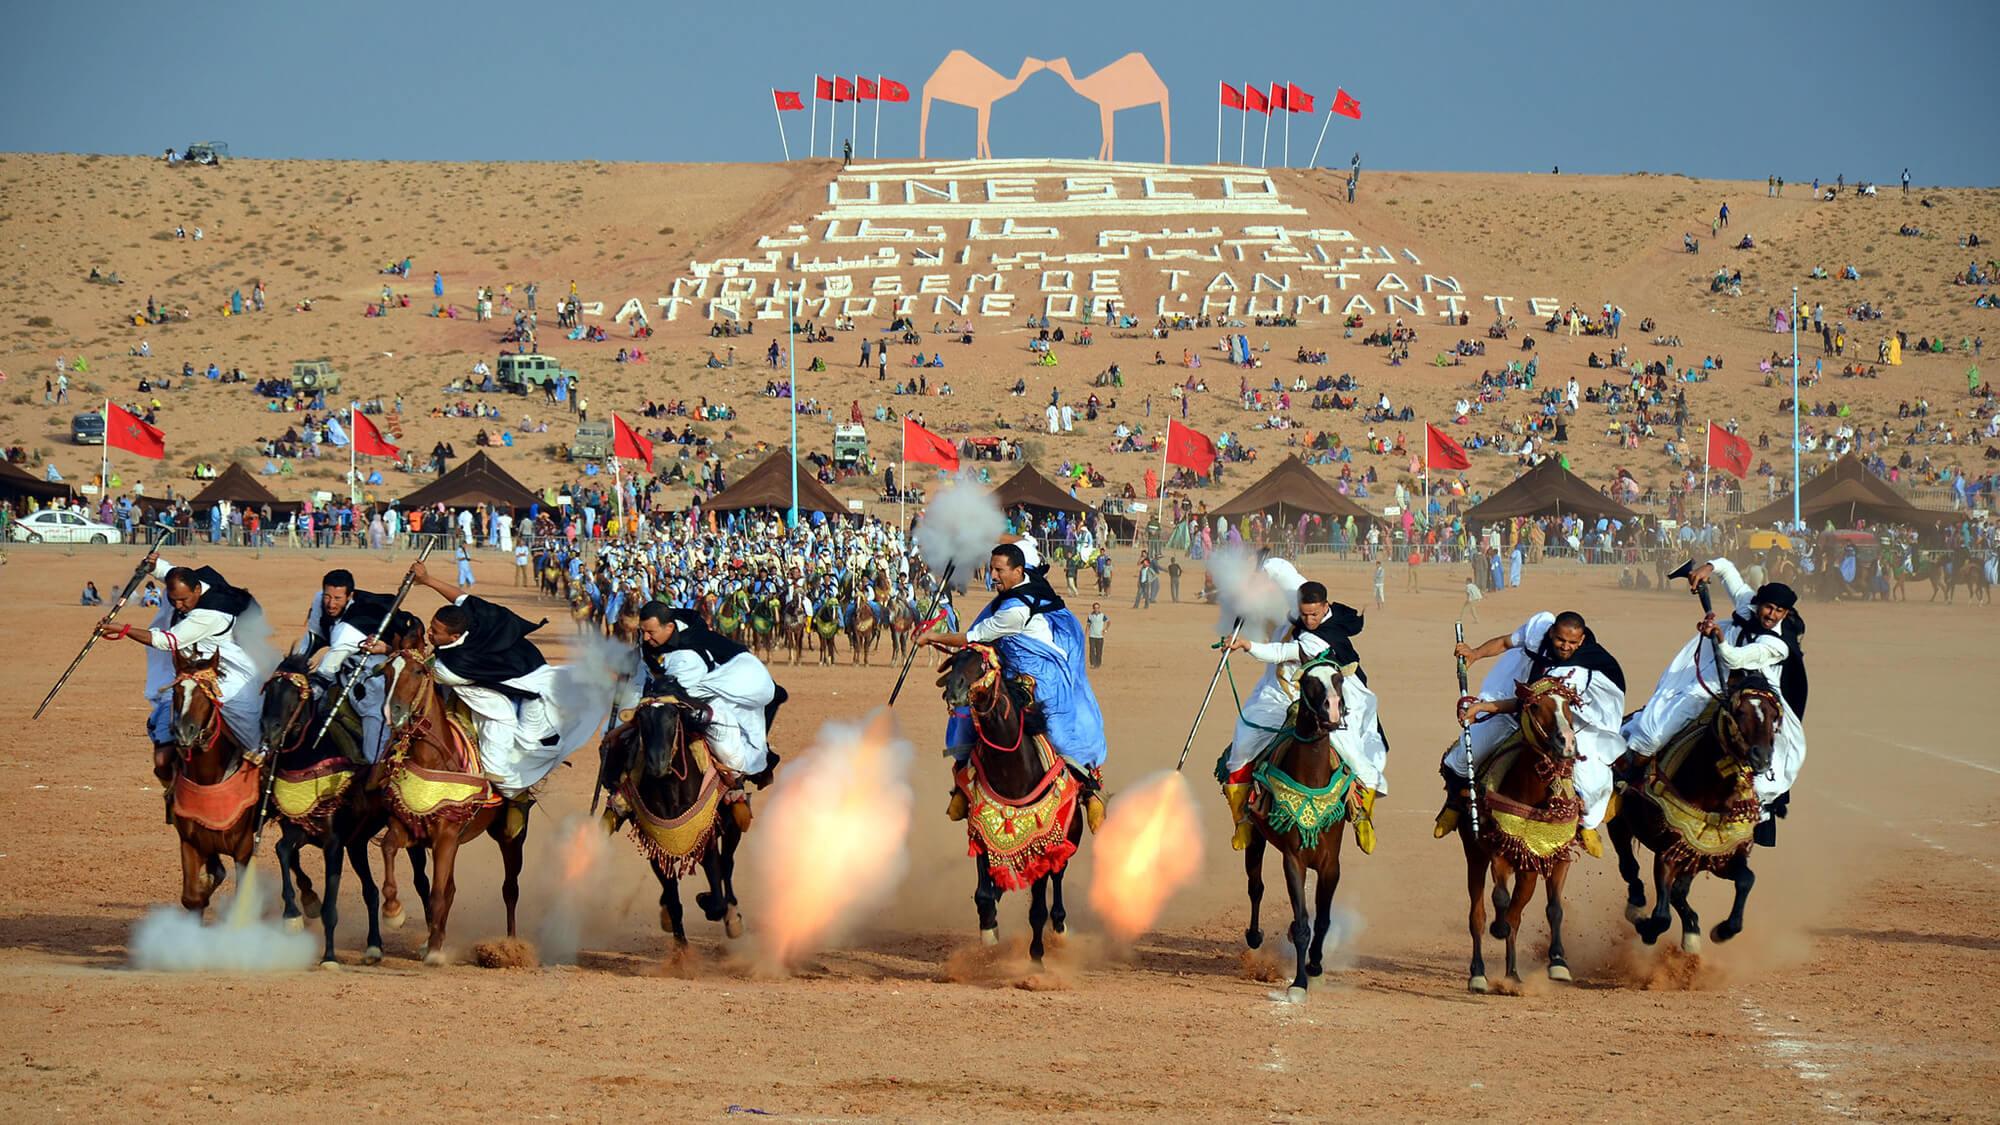 Sahara Desert Tour - Festivals: Discover a More Intimate Side of Morocco - Tan Tan Moussem